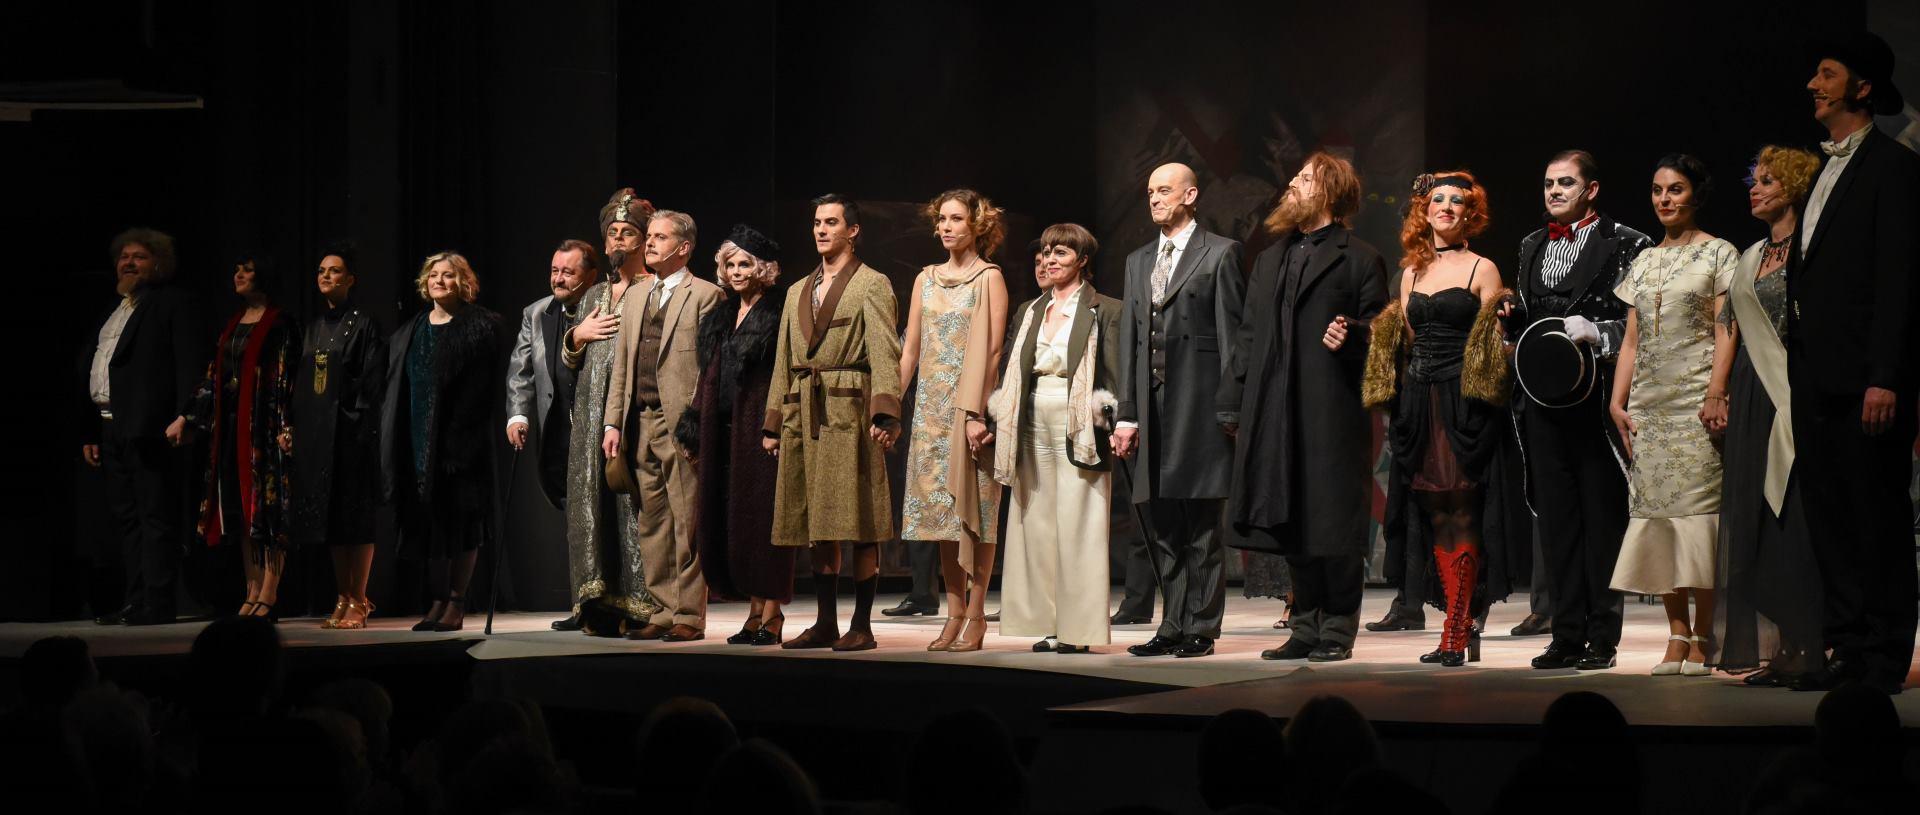 FOTO: Predstva 'Faraon iz Ilice je mrtav' oduševila prepuno Kazalište Komedija